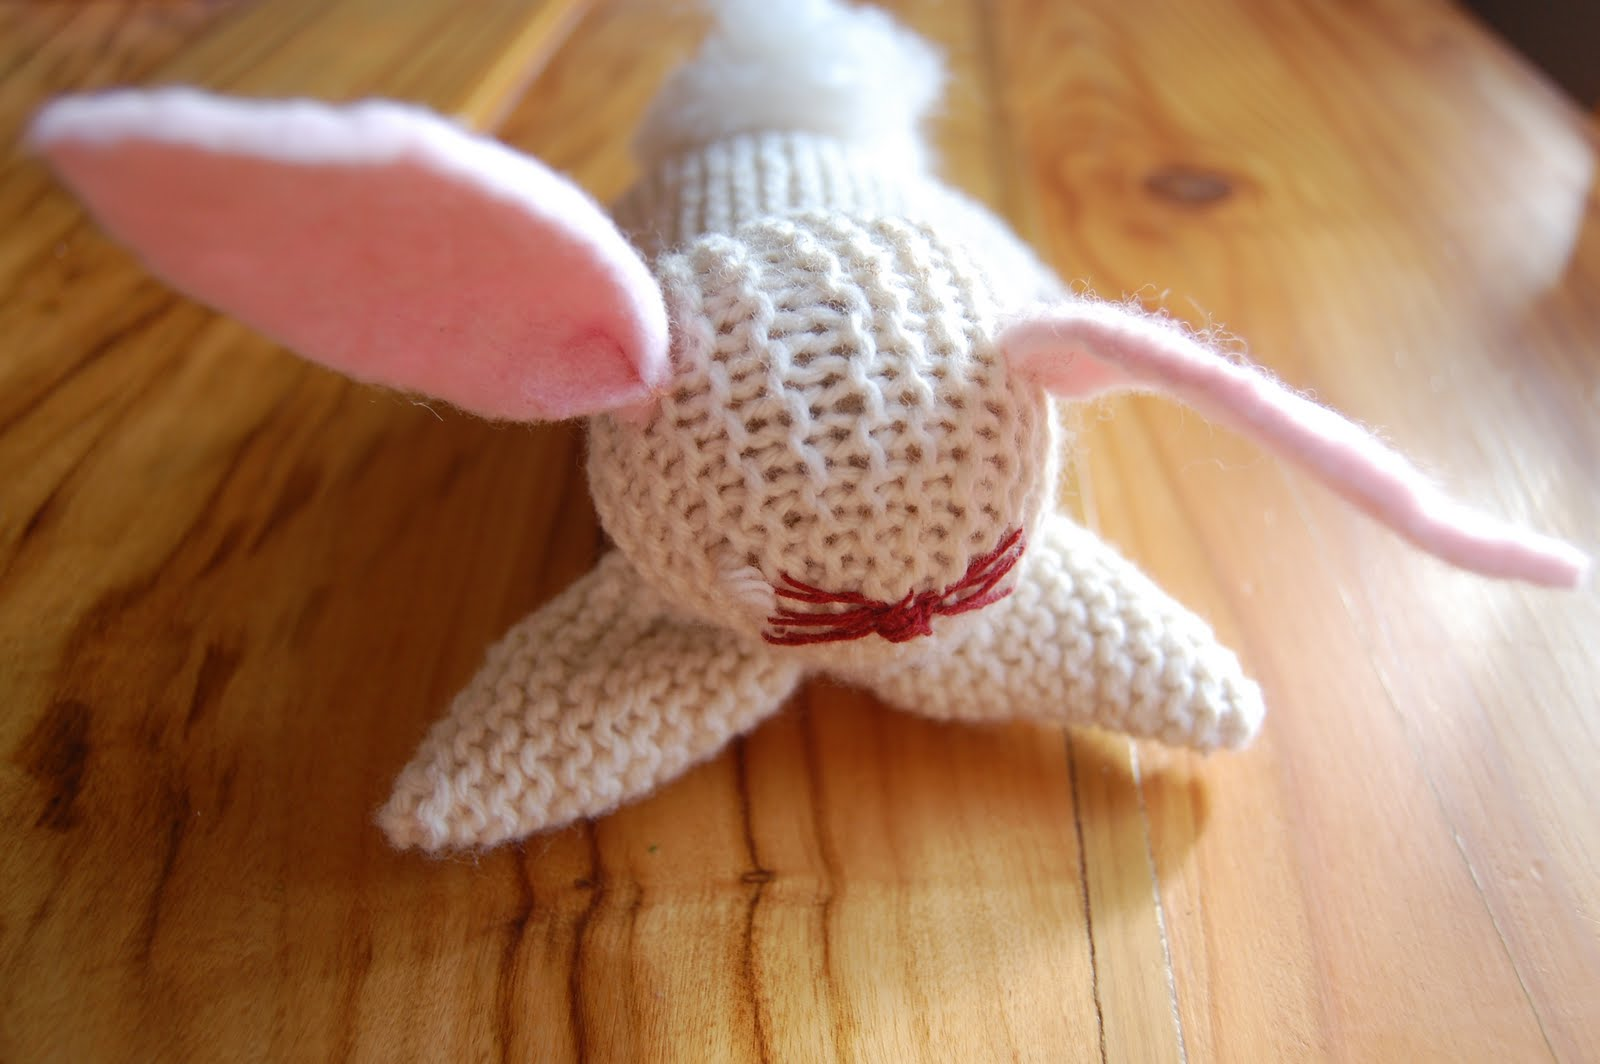 Easy knitting patterns: Knitted Rabbit toy | Educator101Educator101